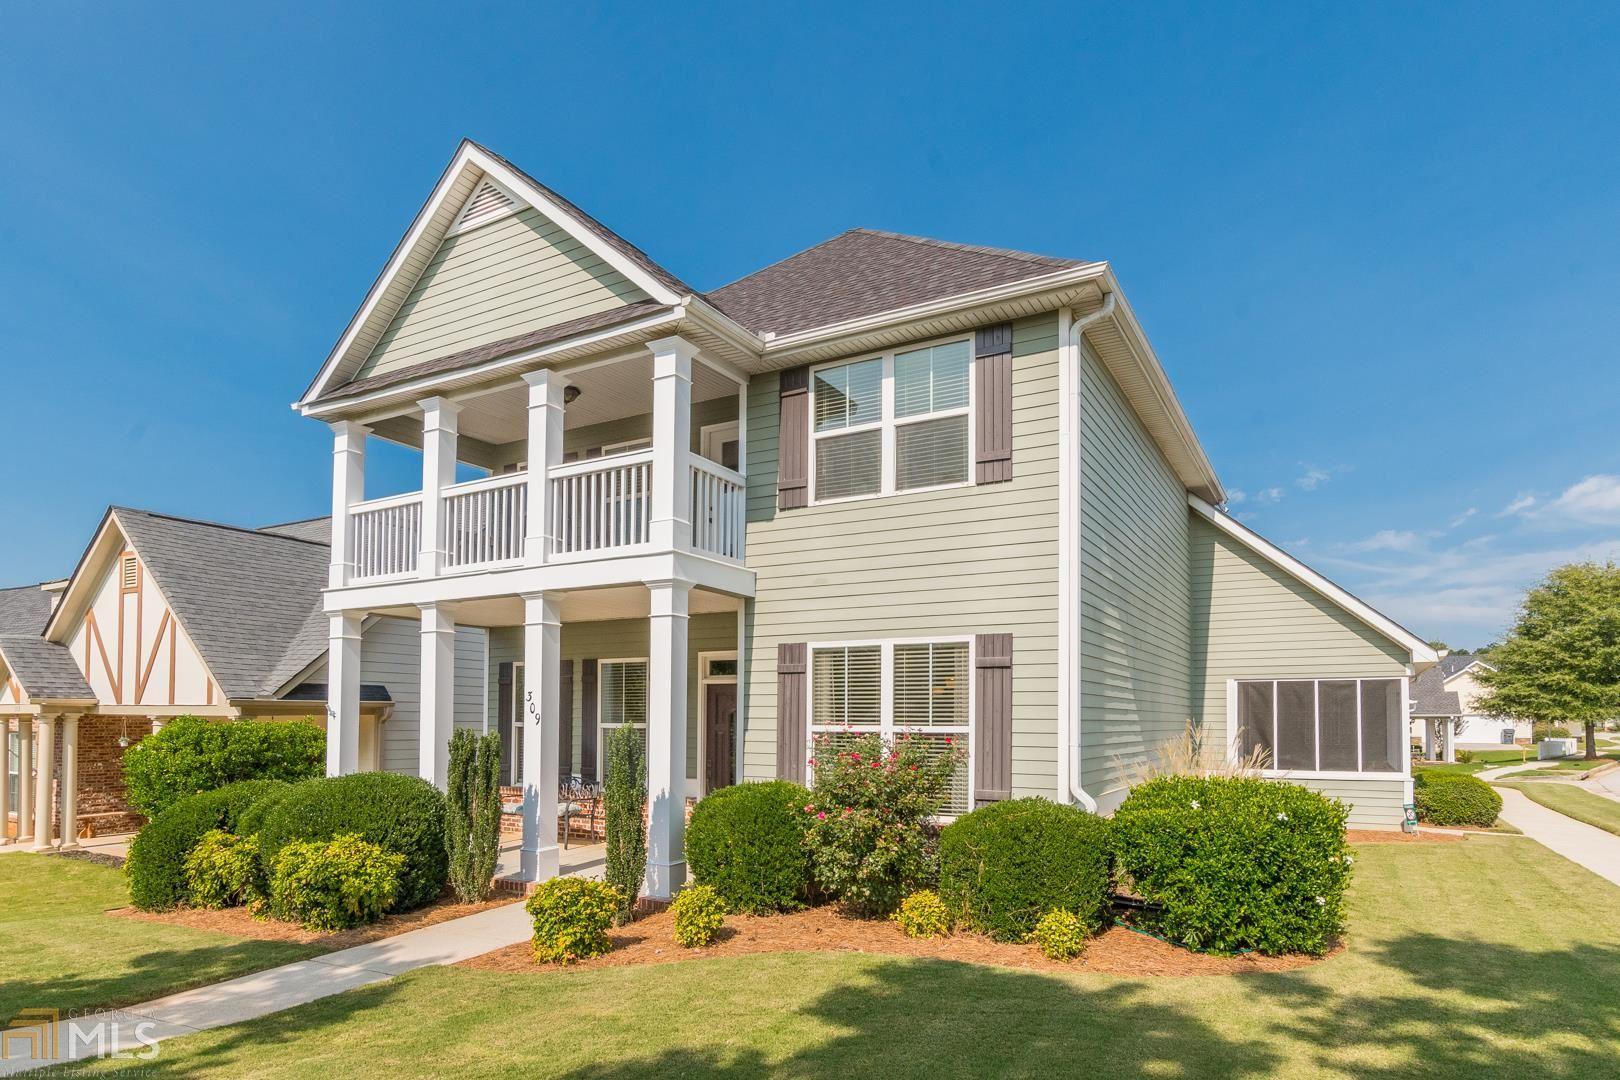 309 New Alcovy Rd, Social Circle, GA 30025 - #: 8844770